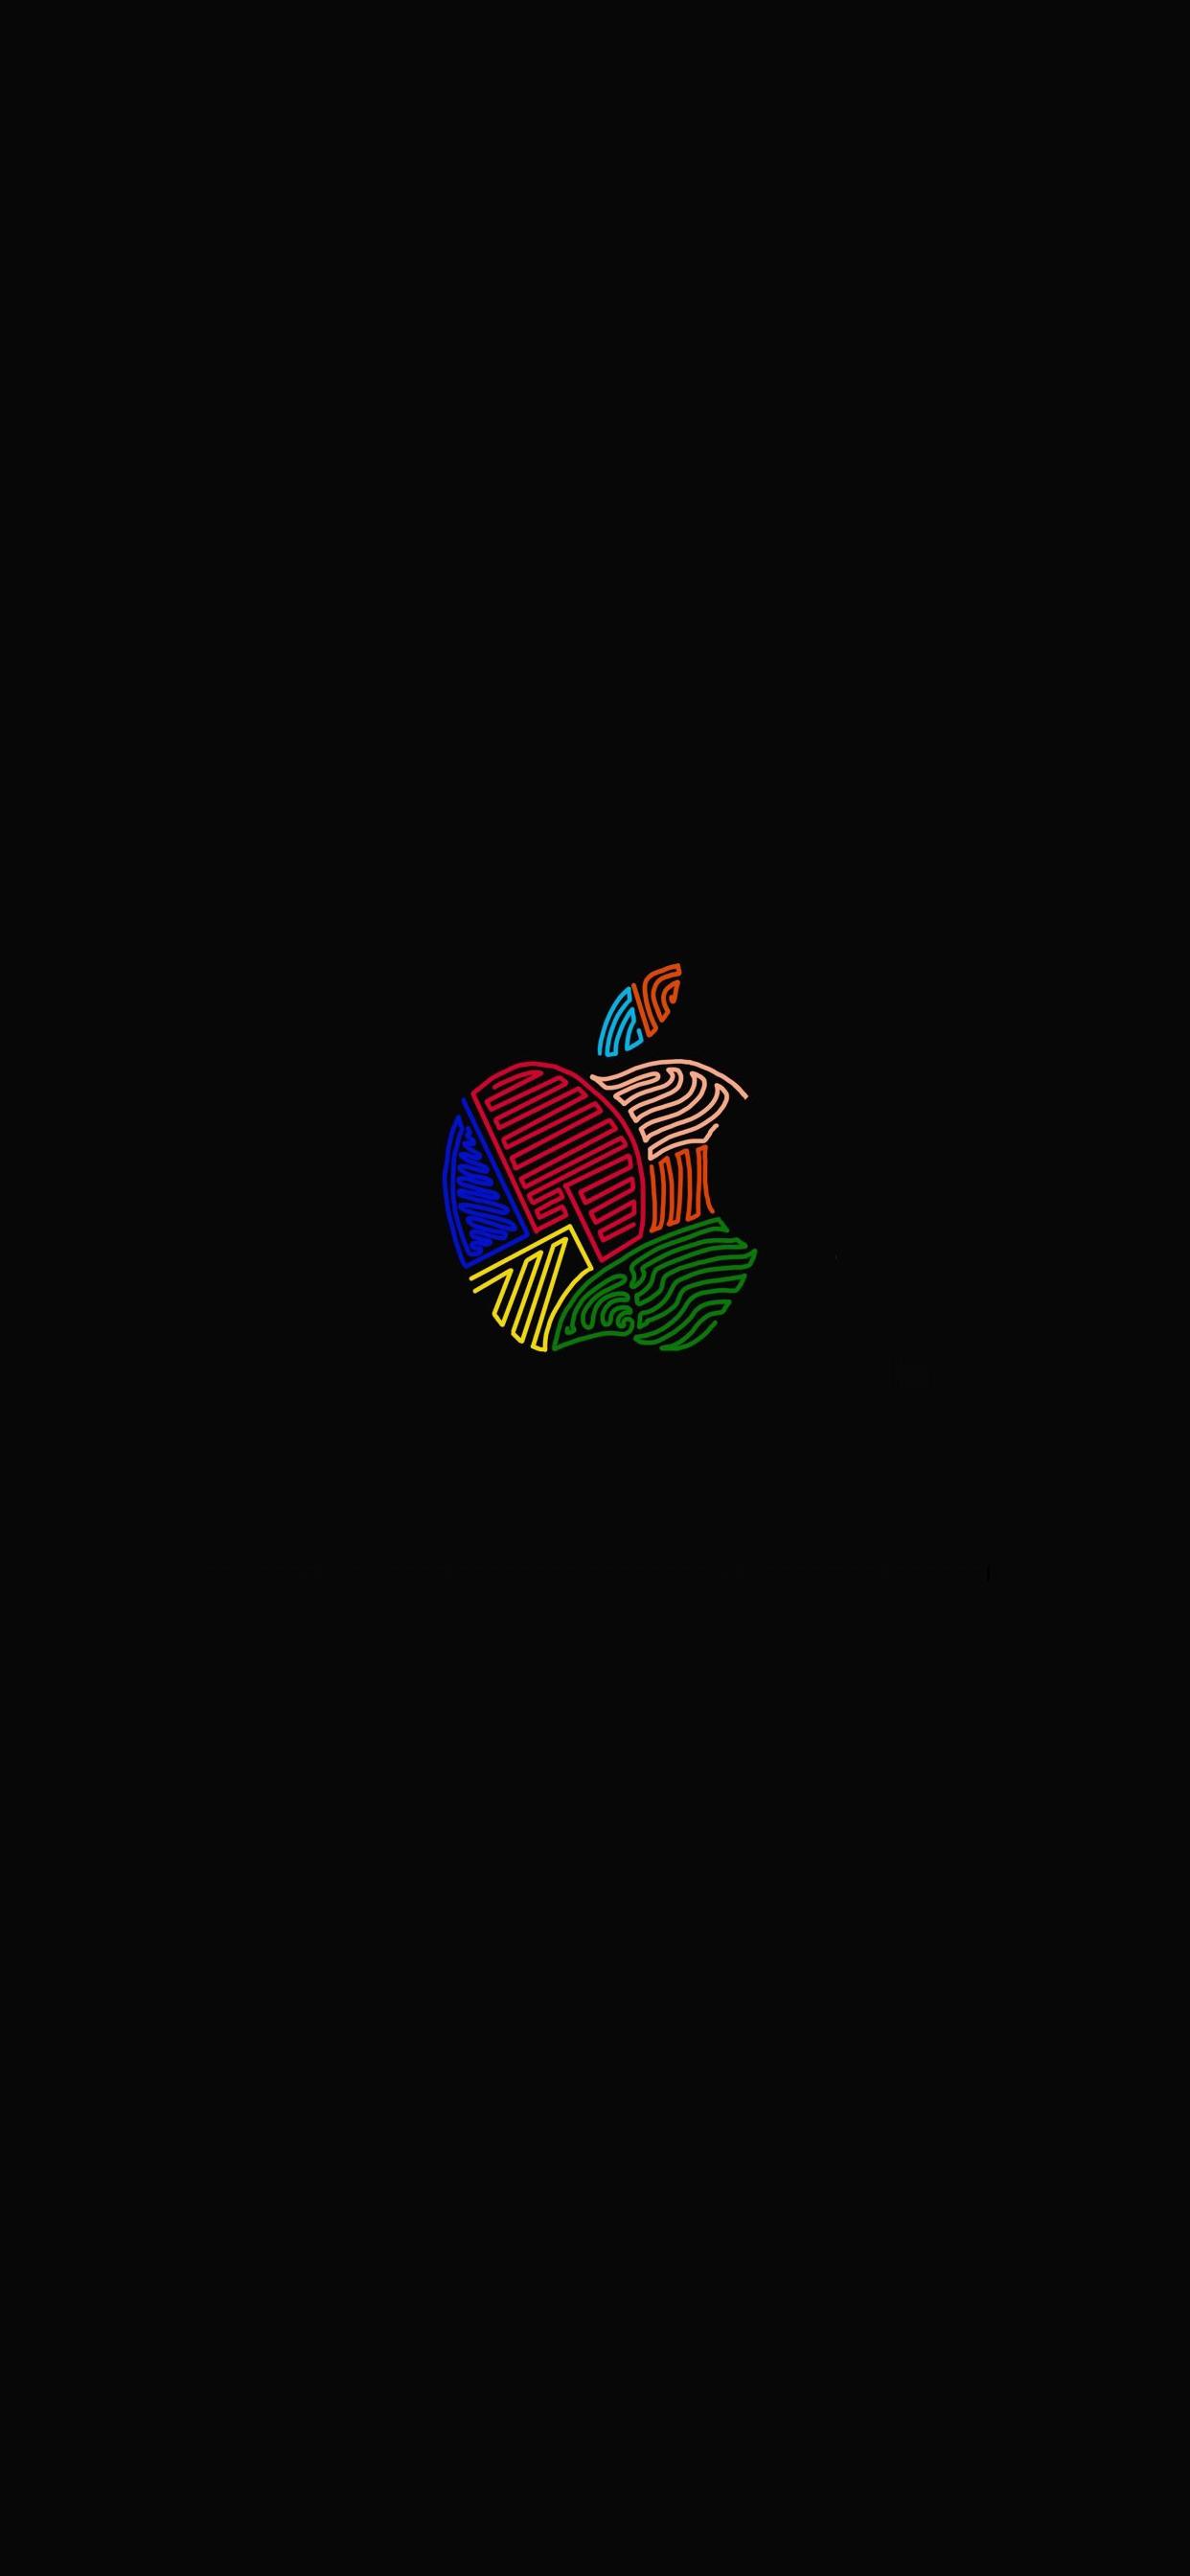 iPhone wallpaper apple logo 30 Apple logo